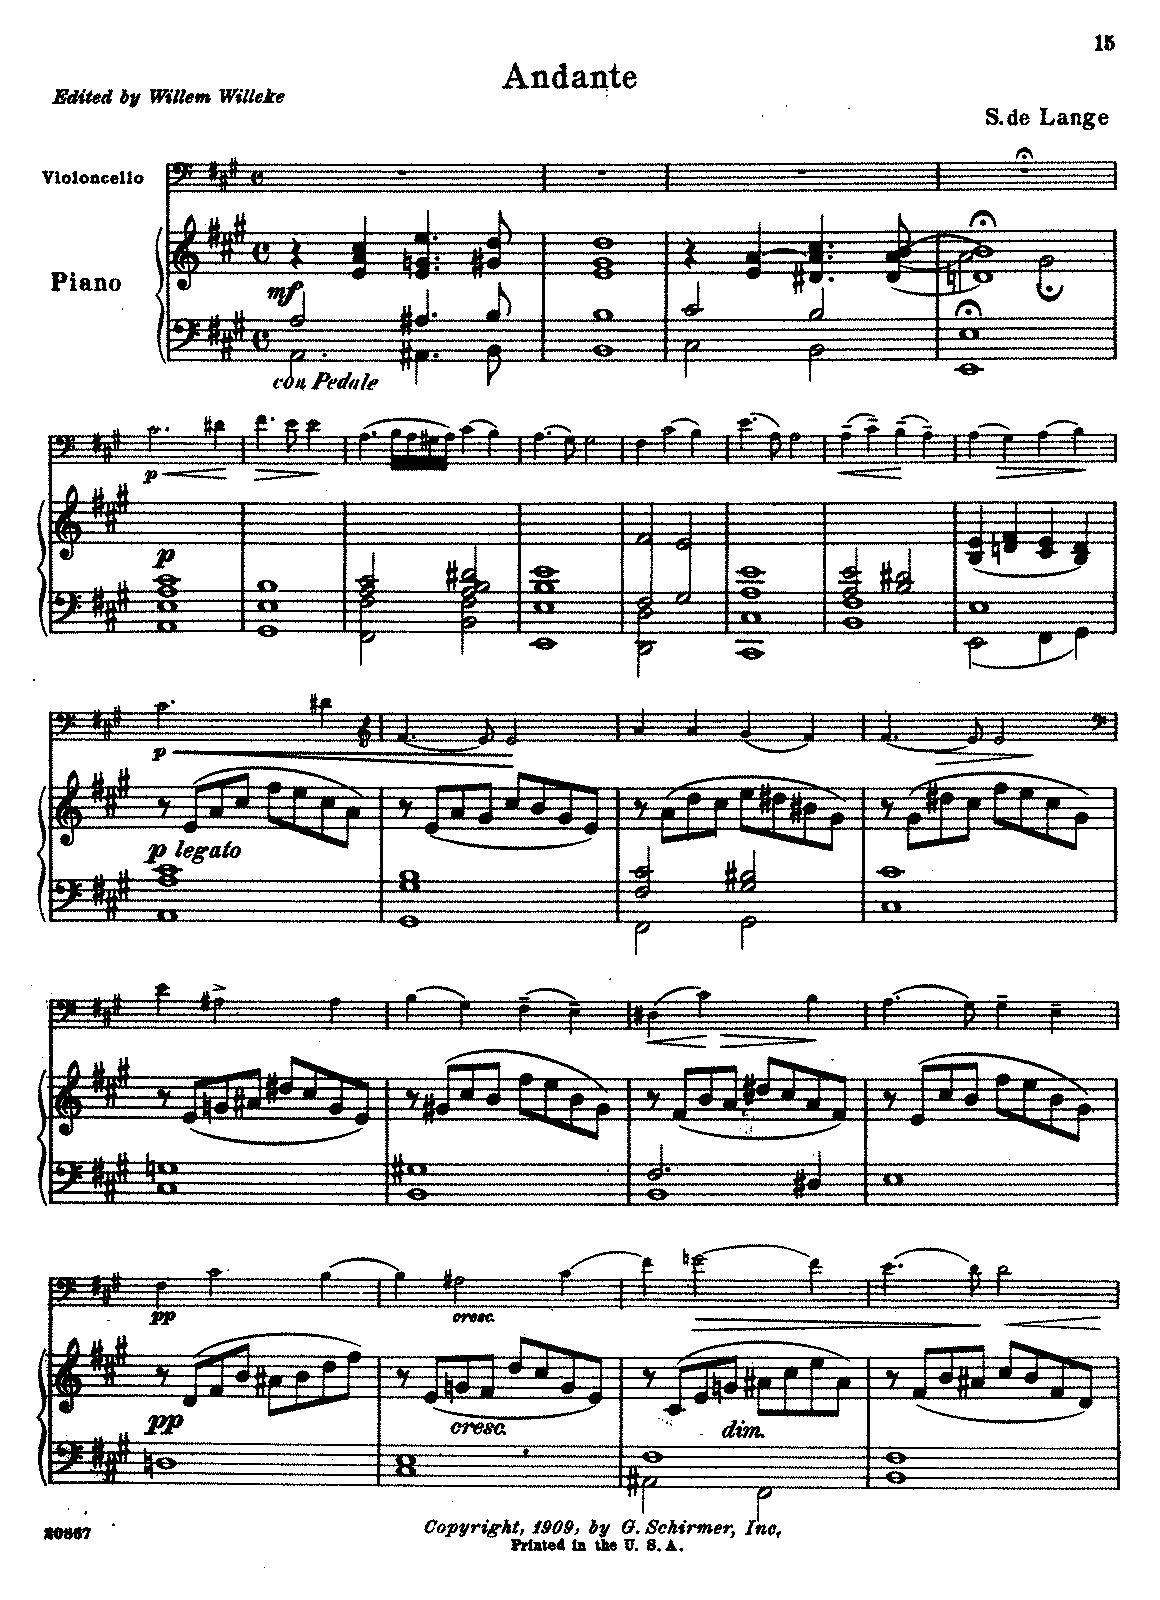 Andante in A major (Lange Sr , Samuel de) - IMSLP/Petrucci Music